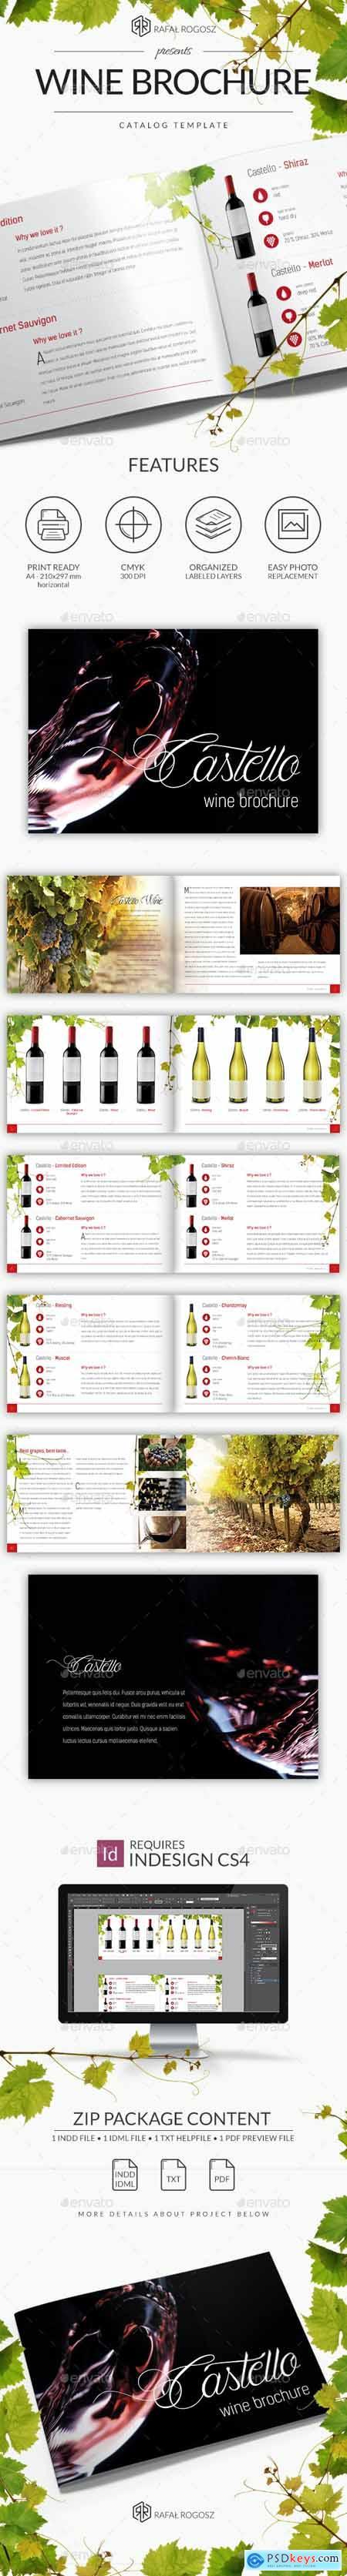 Wine Grape Brochure A4 Horizontal 20652426